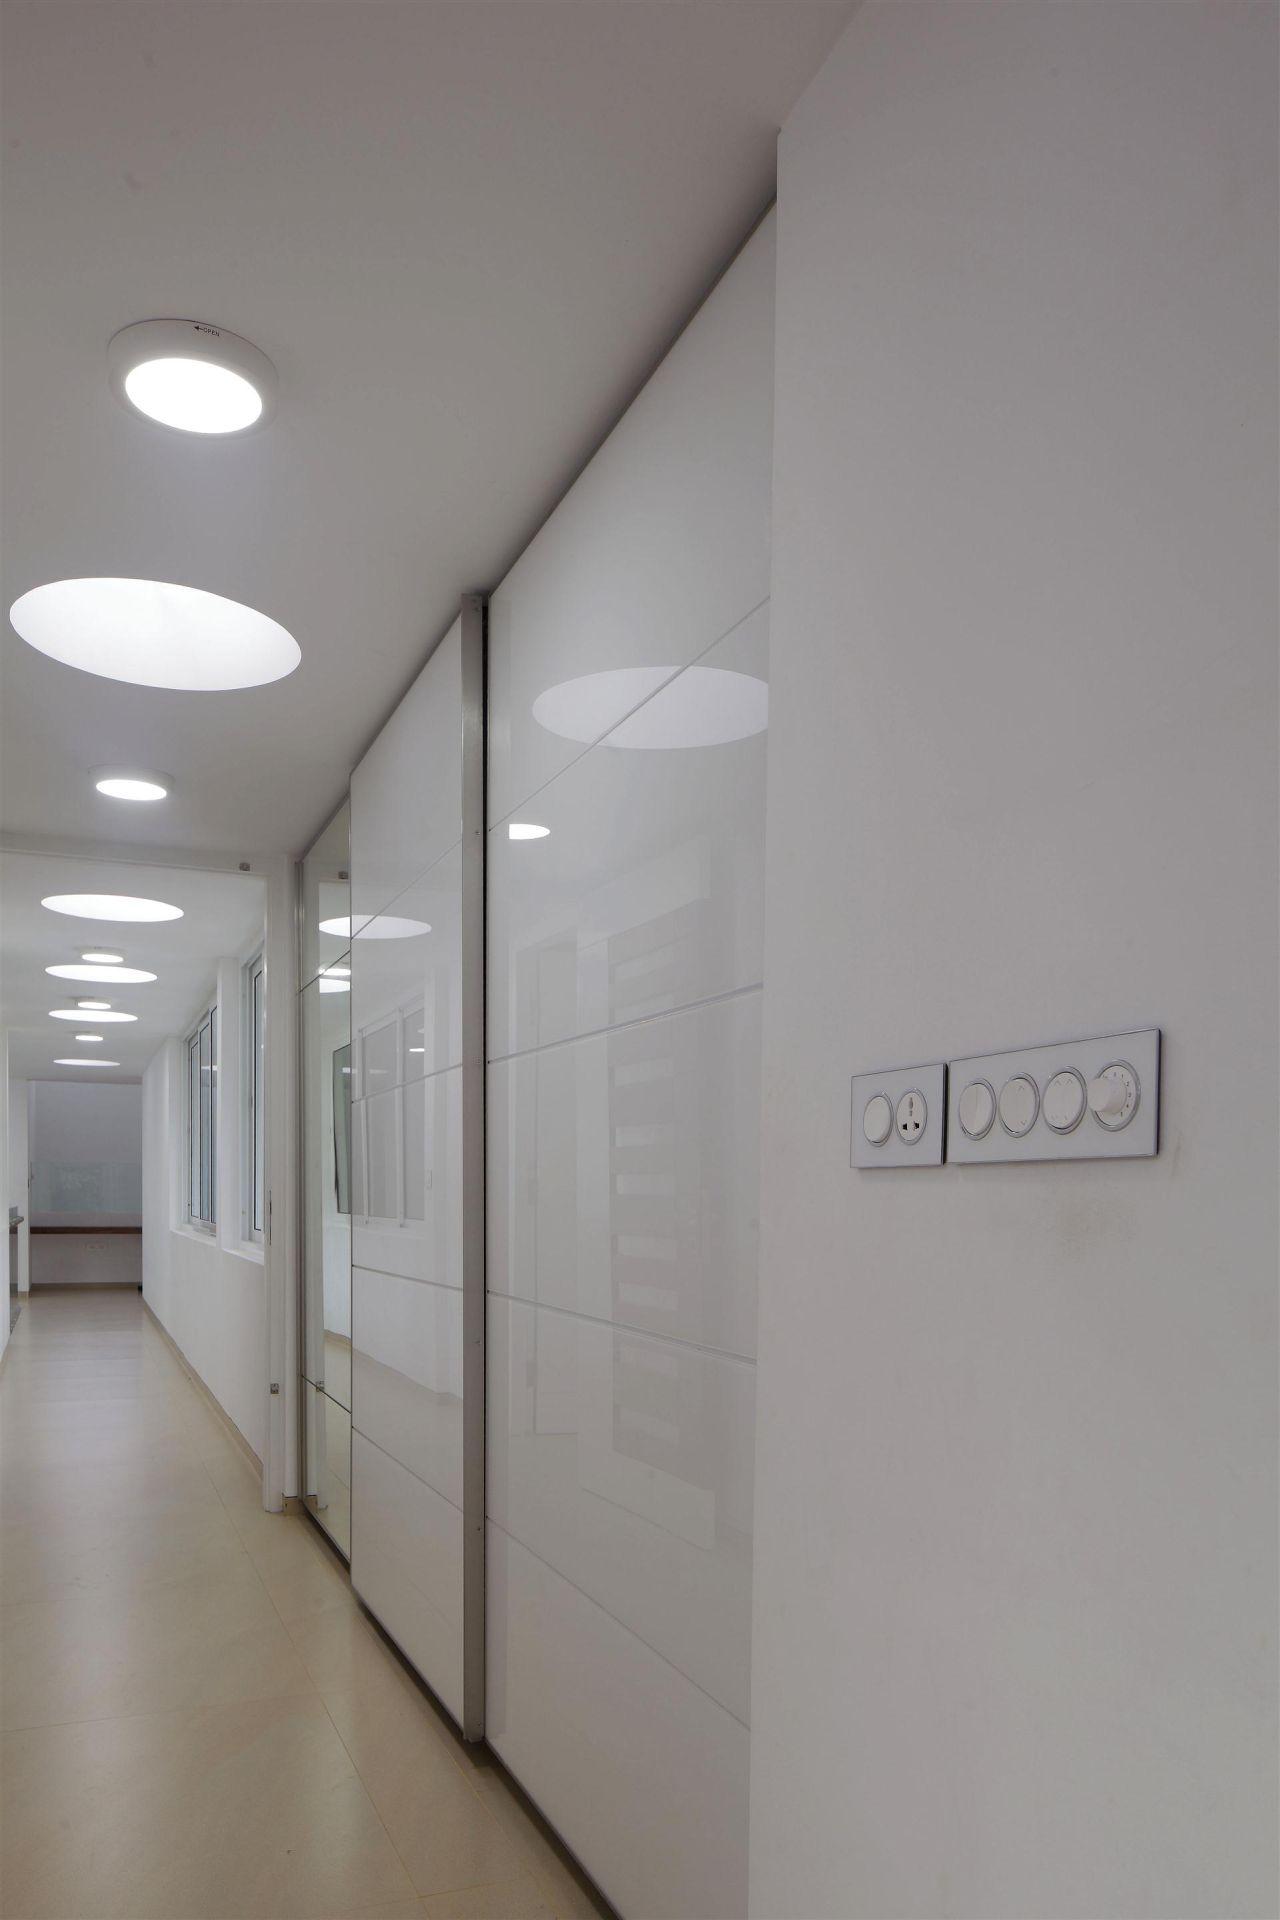 runningwallresidenceLIJO-RENY-Architects.jpg13